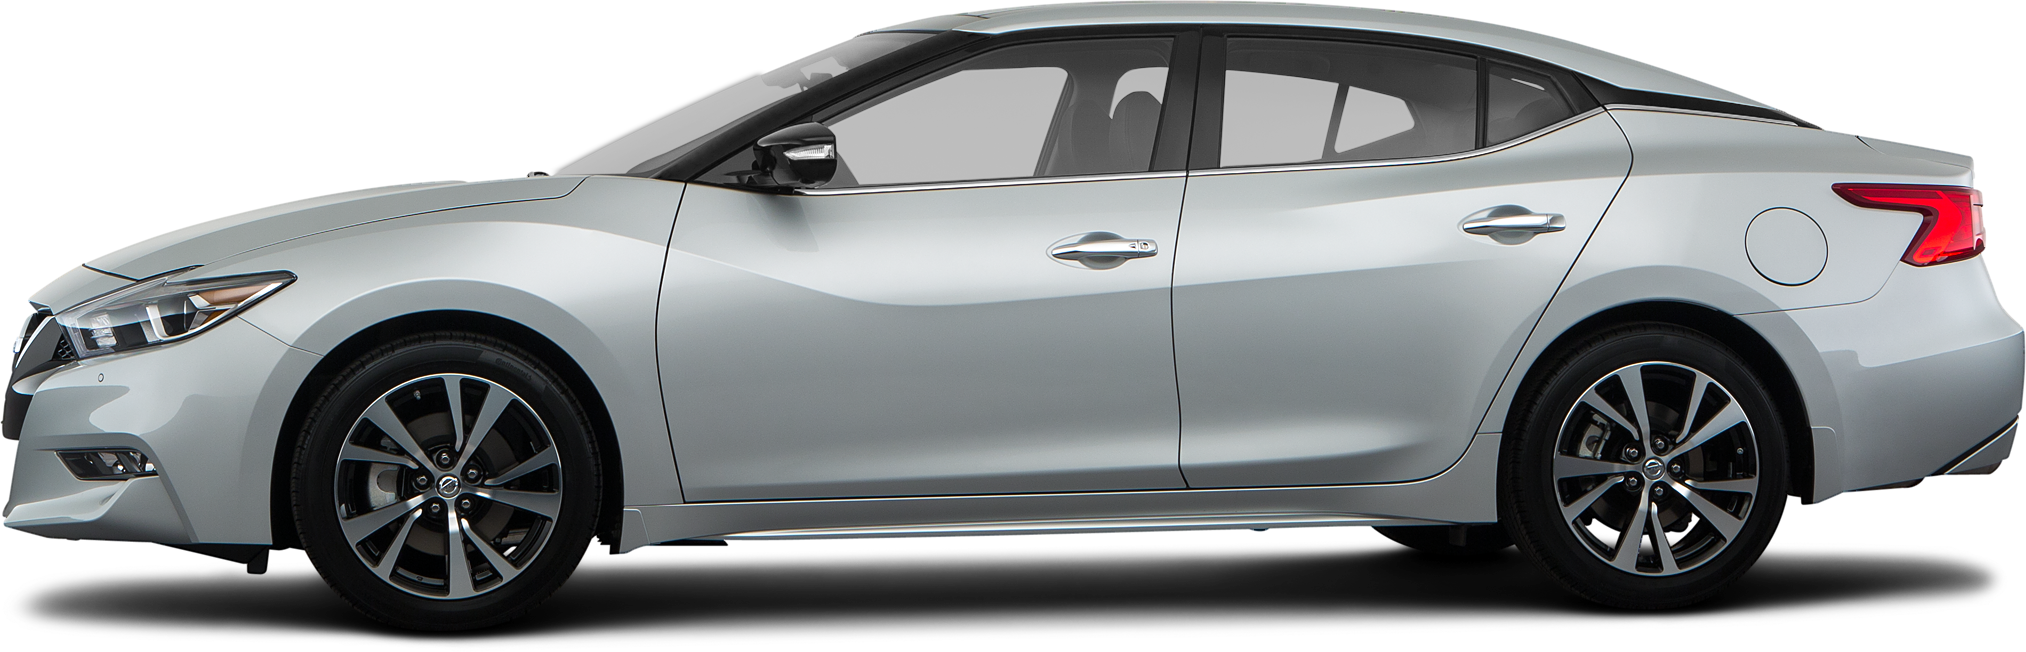 2018 Nissan Maxima Sedan 3.5 Platinum